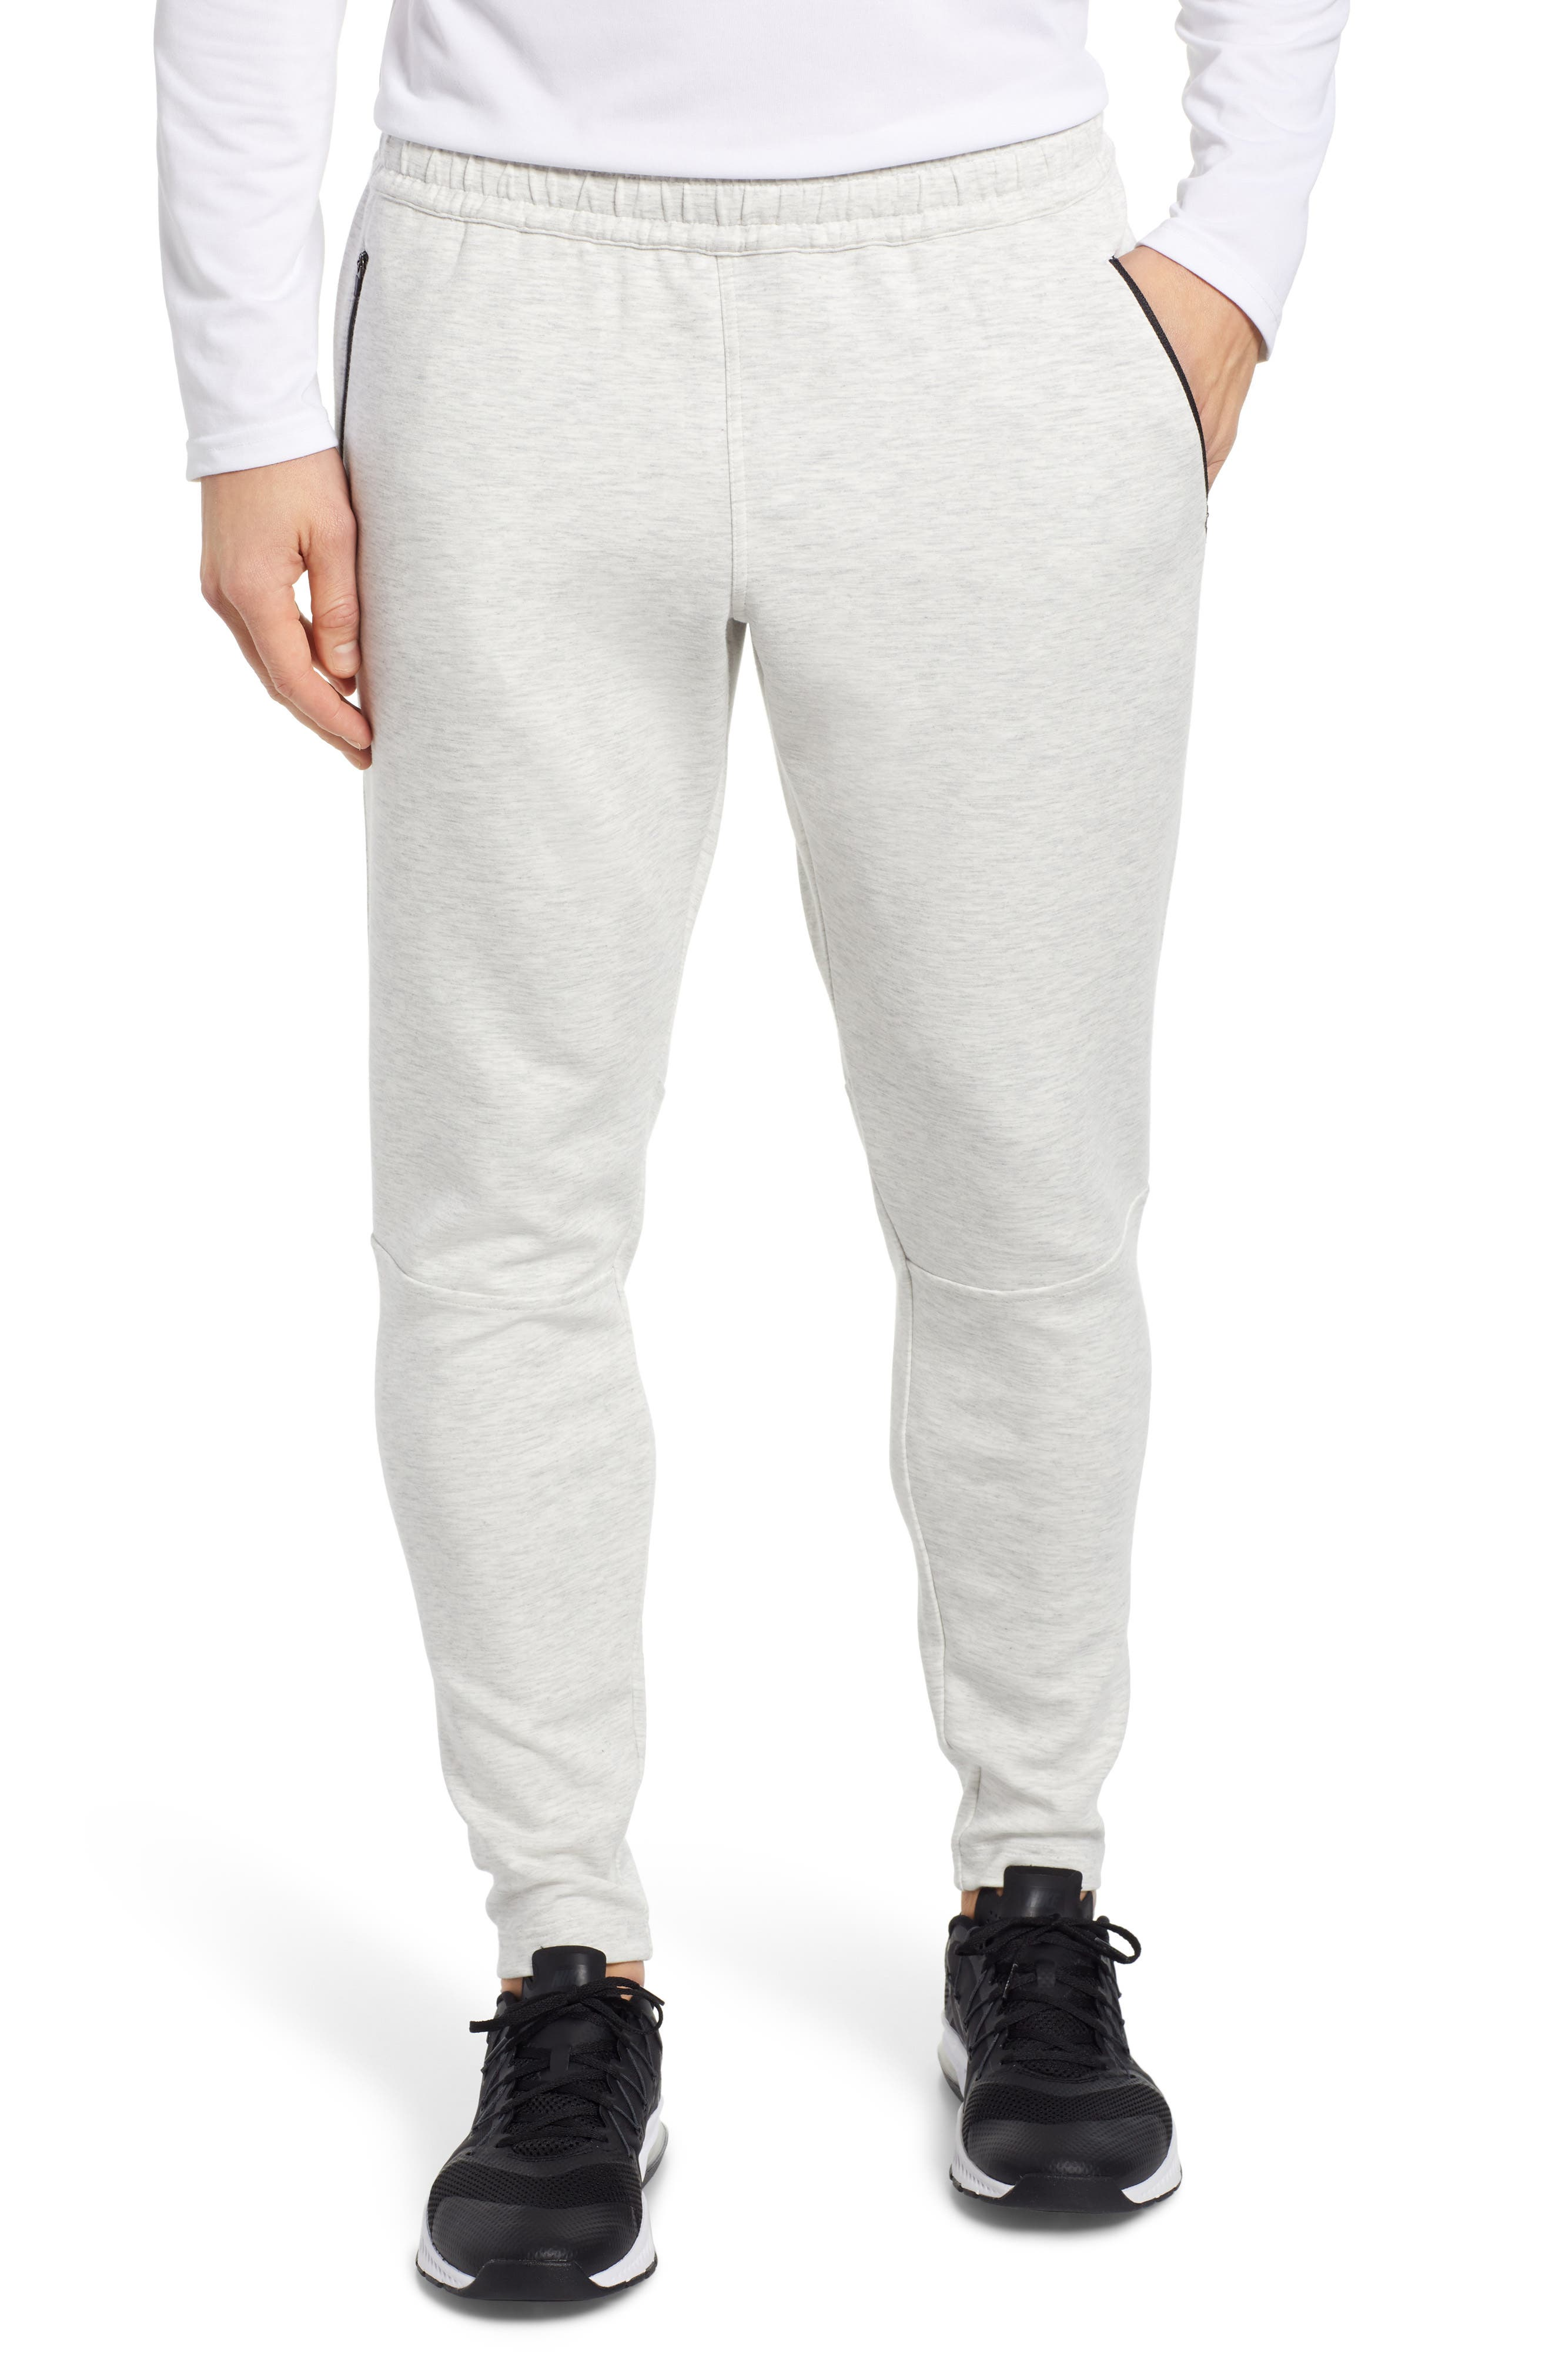 ZELLA Zip Pocket Tech Jogger Pants, Main, color, WHITE OXIDE MELANGE